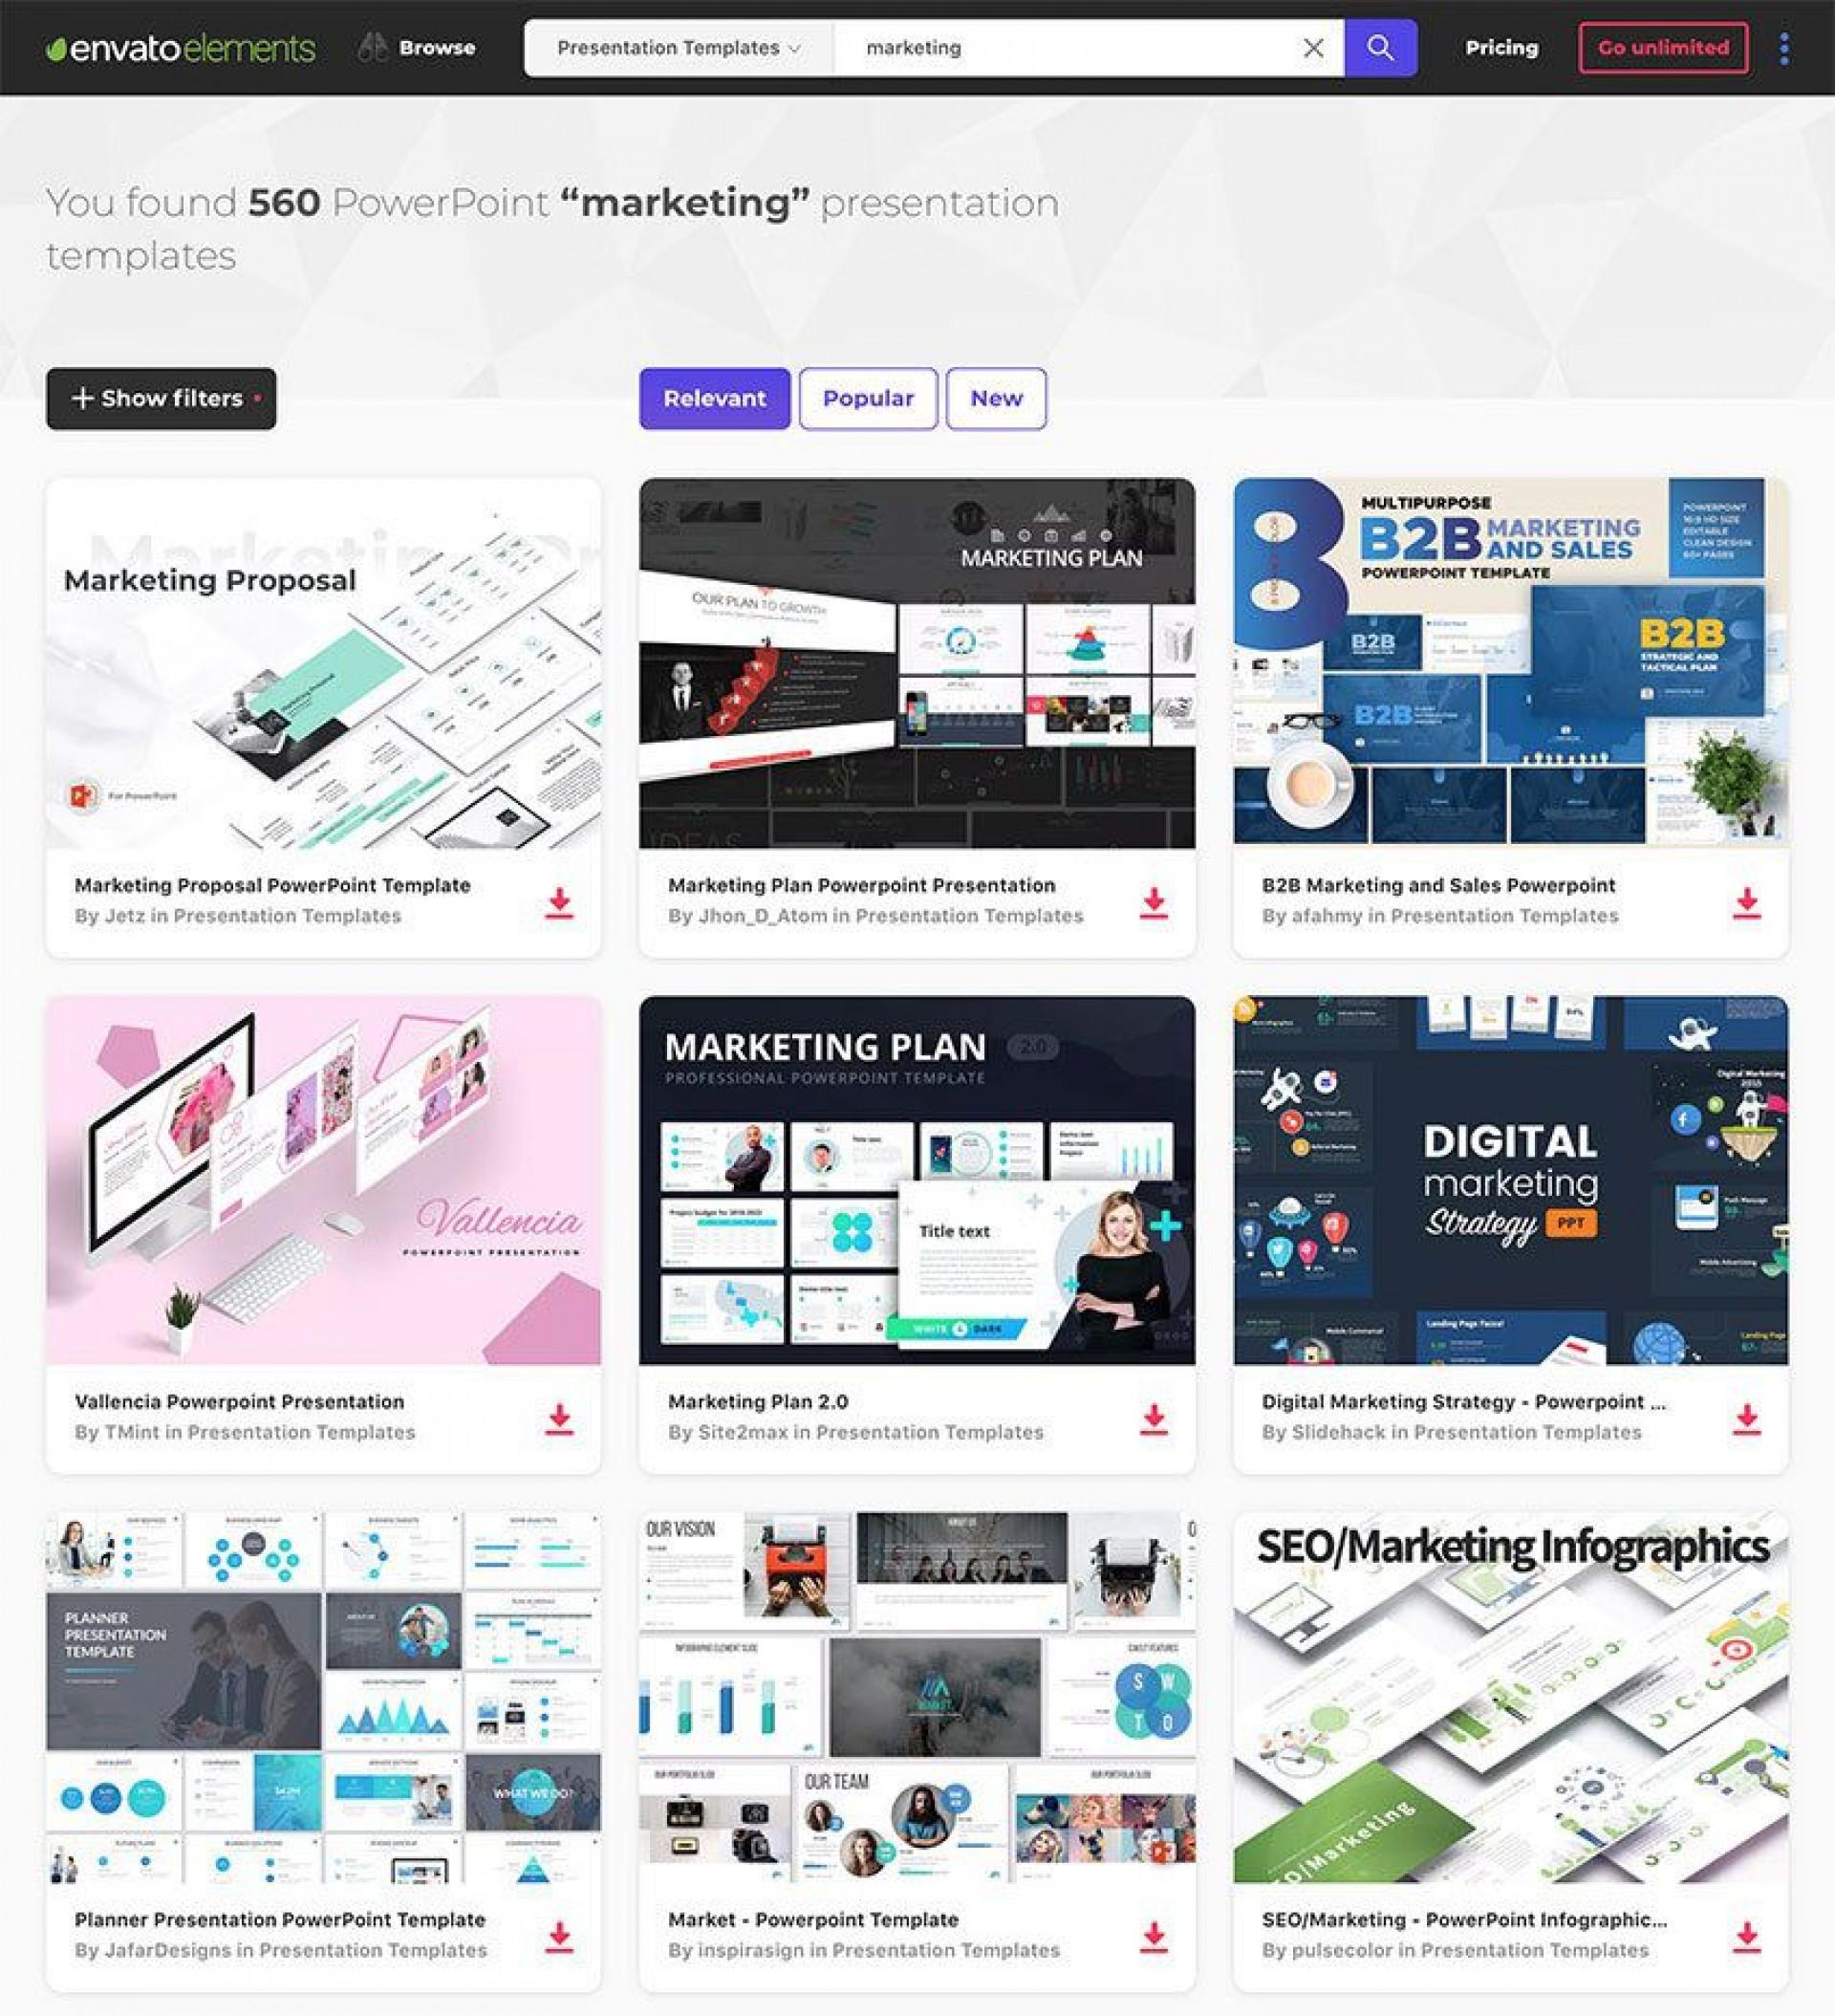 004 Breathtaking Digital Marketing Plan Template Download Image 1920